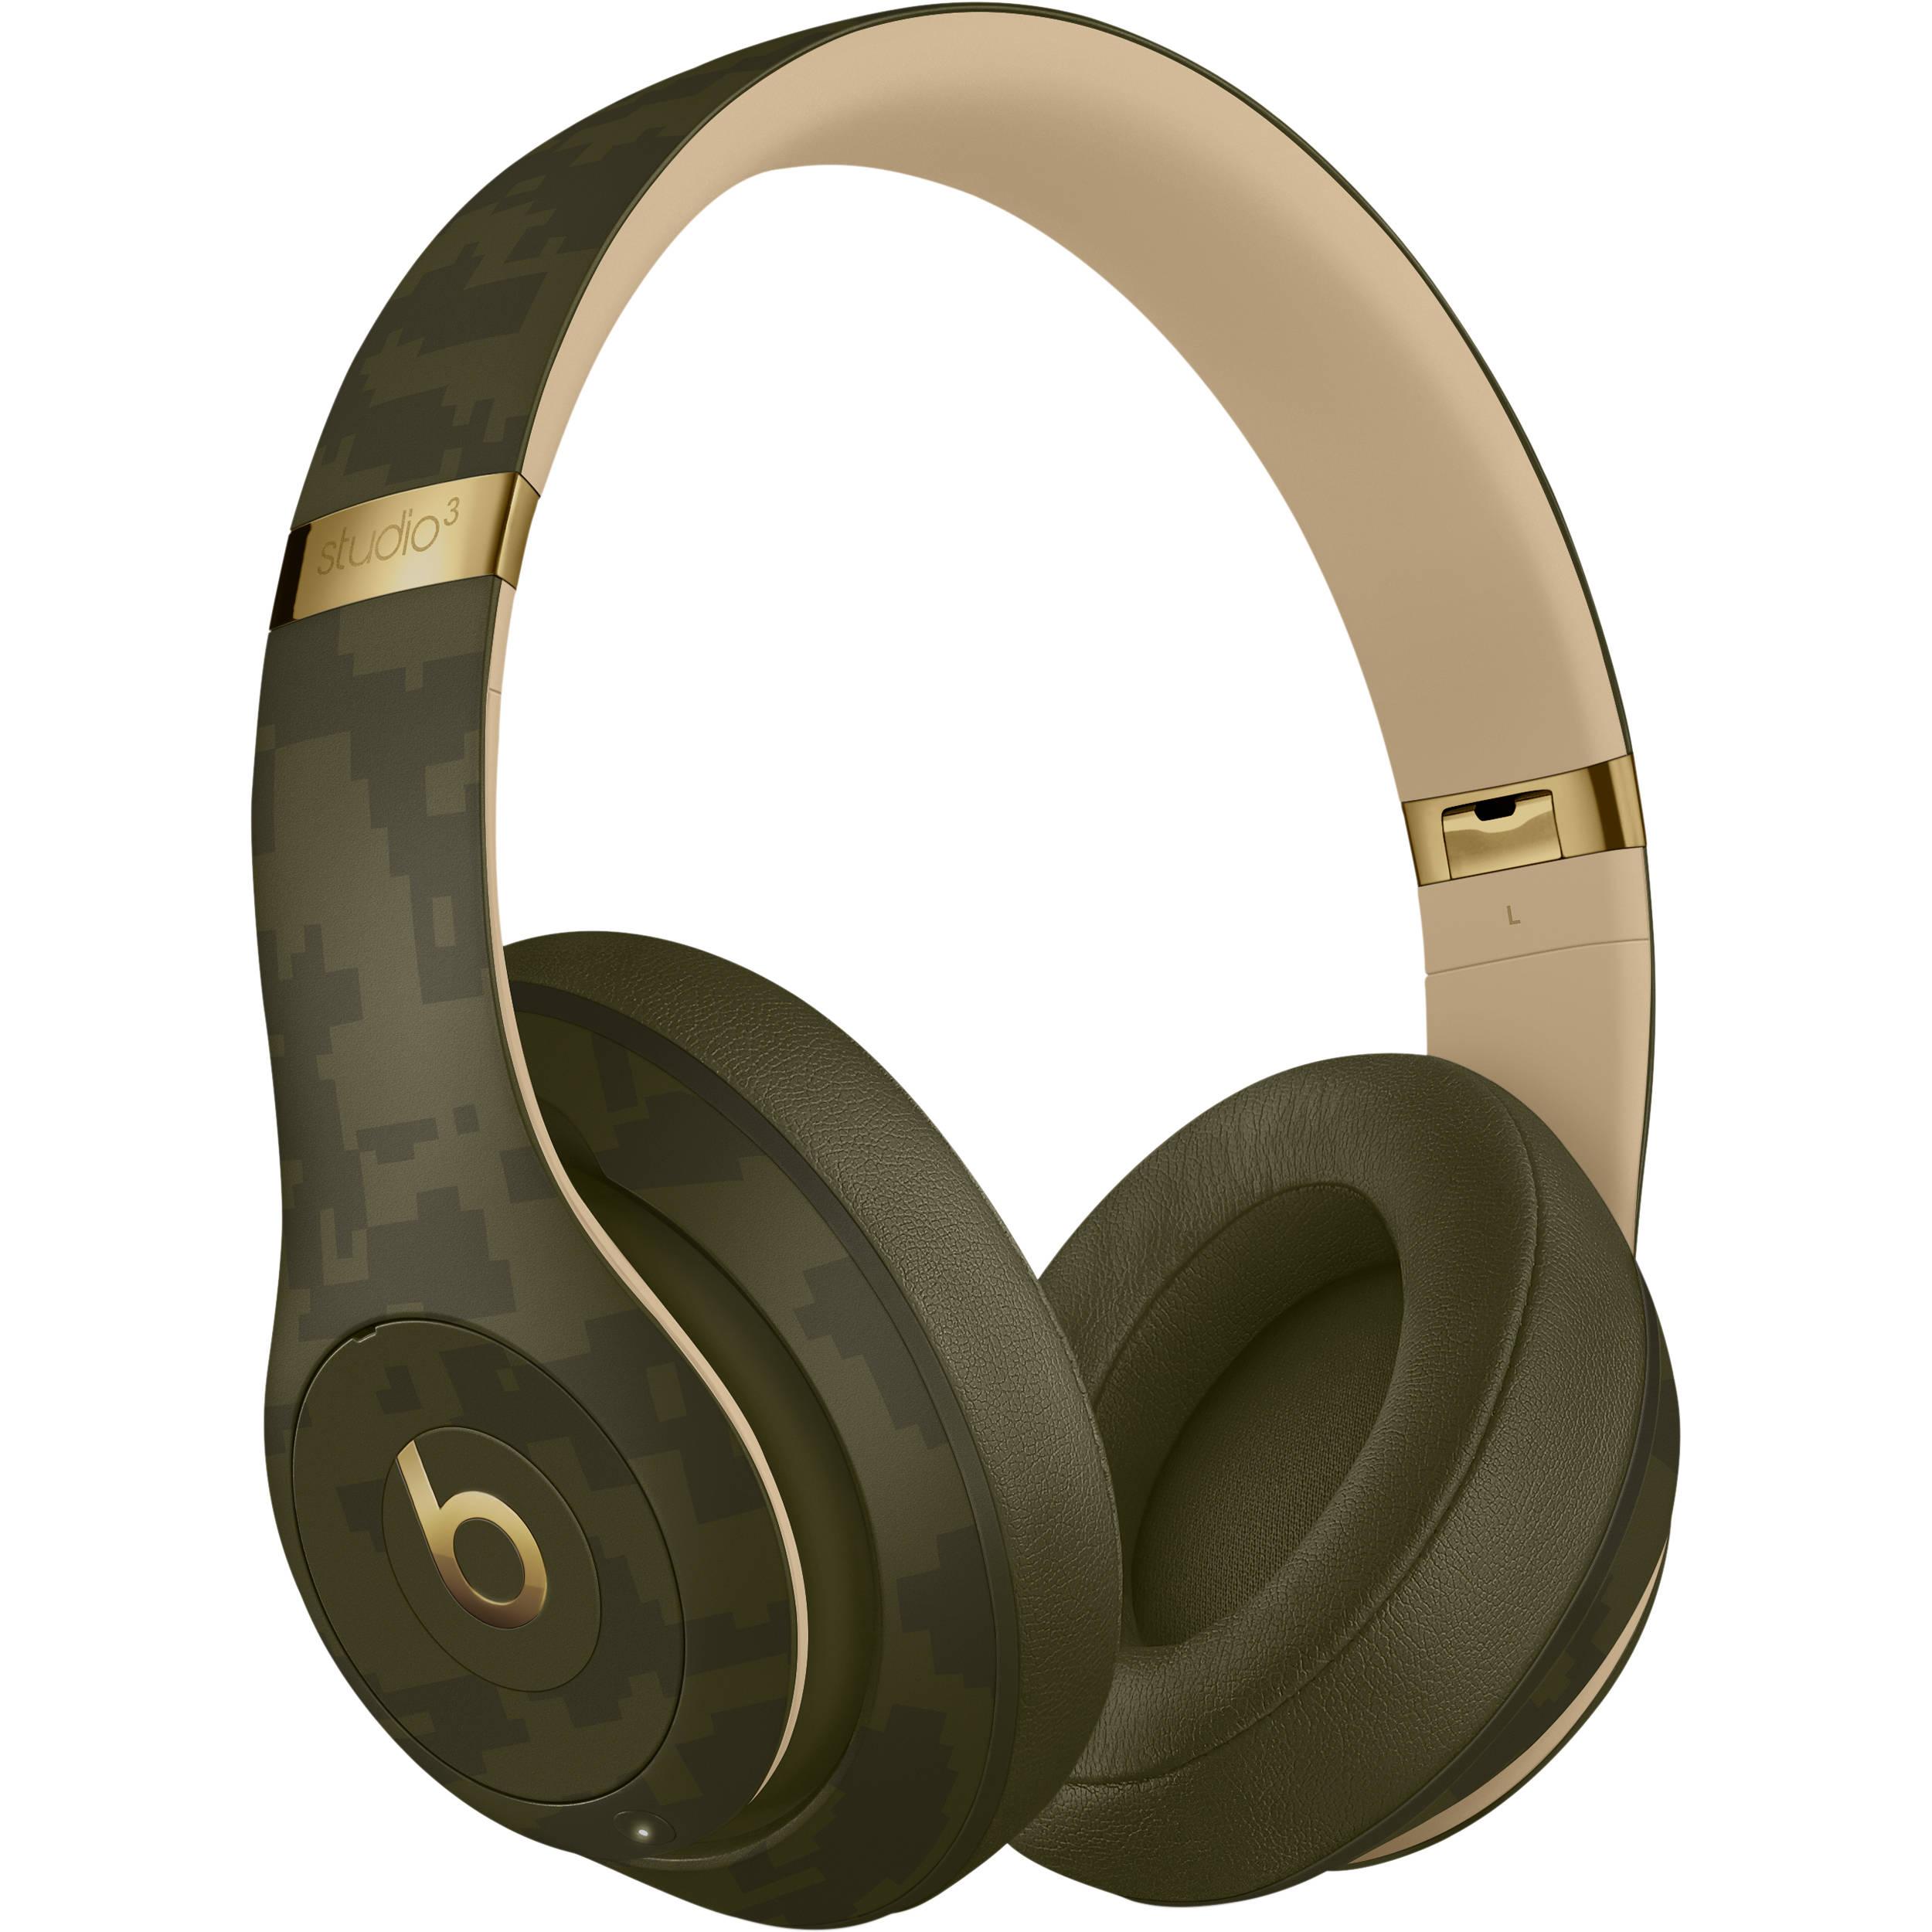 Beats By Dr Dre Studio3 Wireless Bluetooth Headphones Mx412ll A